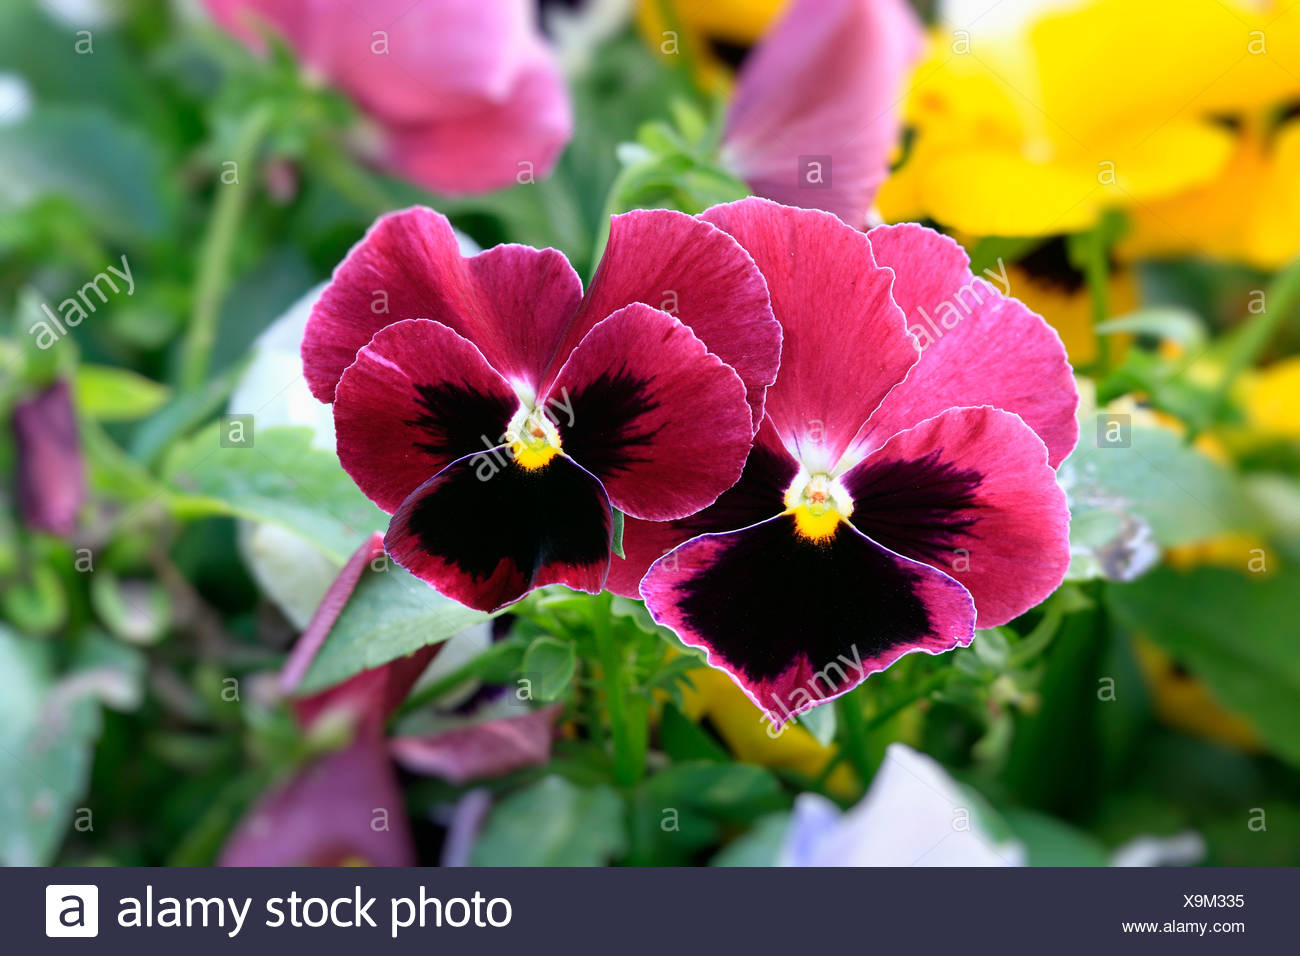 Horned Pansy (Viola cornuta), Germany, Europe - Stock Image